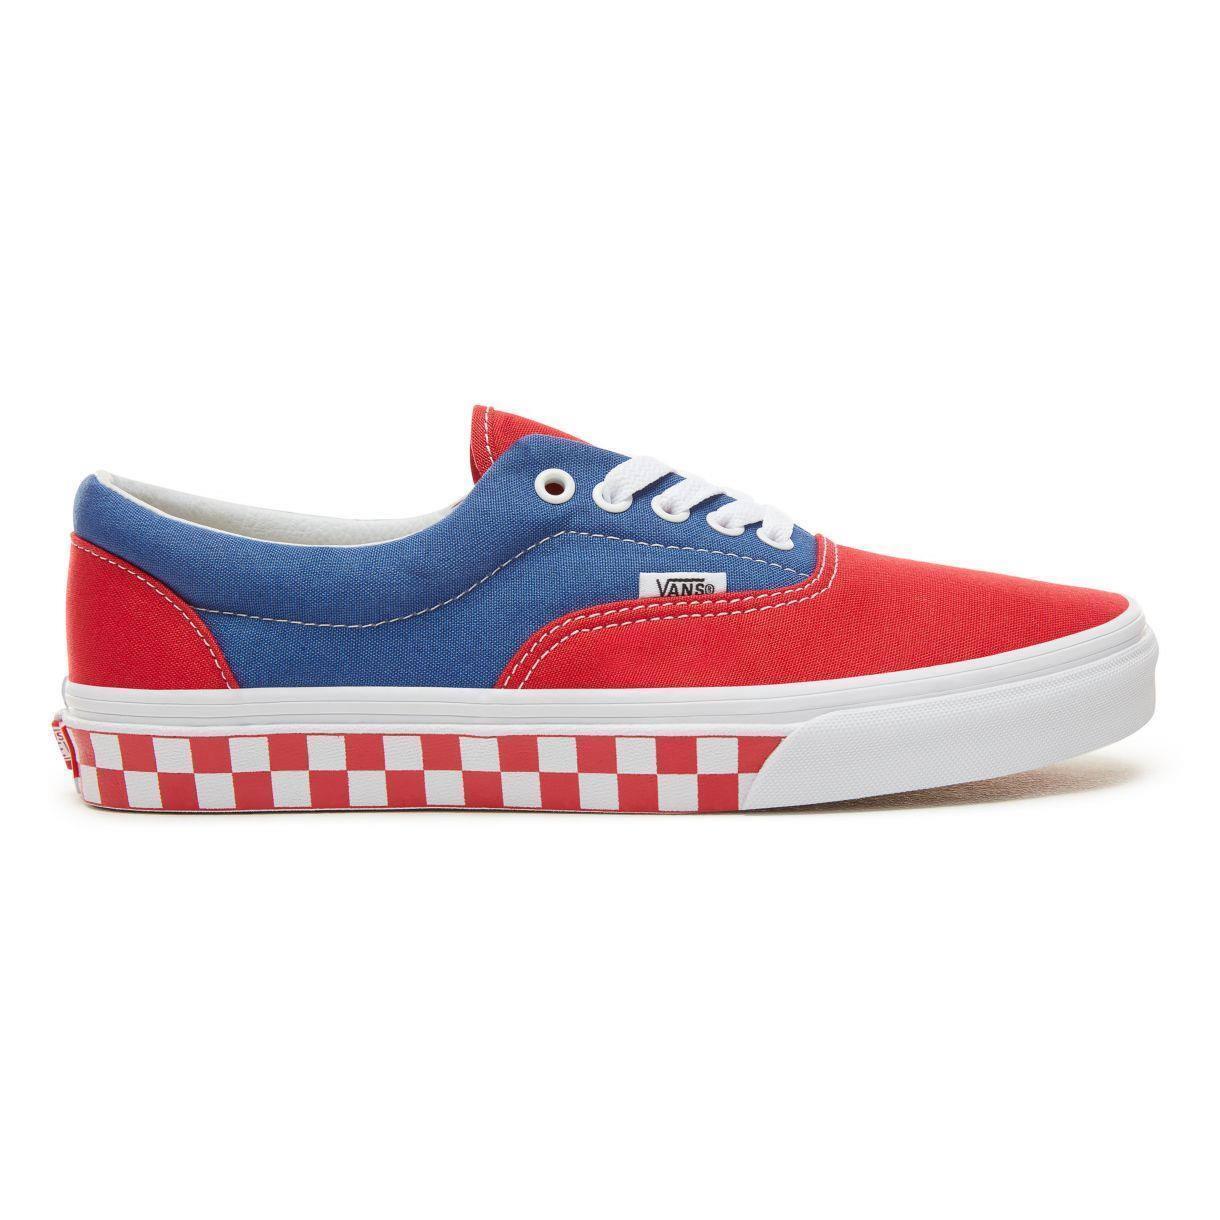 Vans Era Chaussures BMX damier bleu véritable/rouge skate old skool Skyway Mon